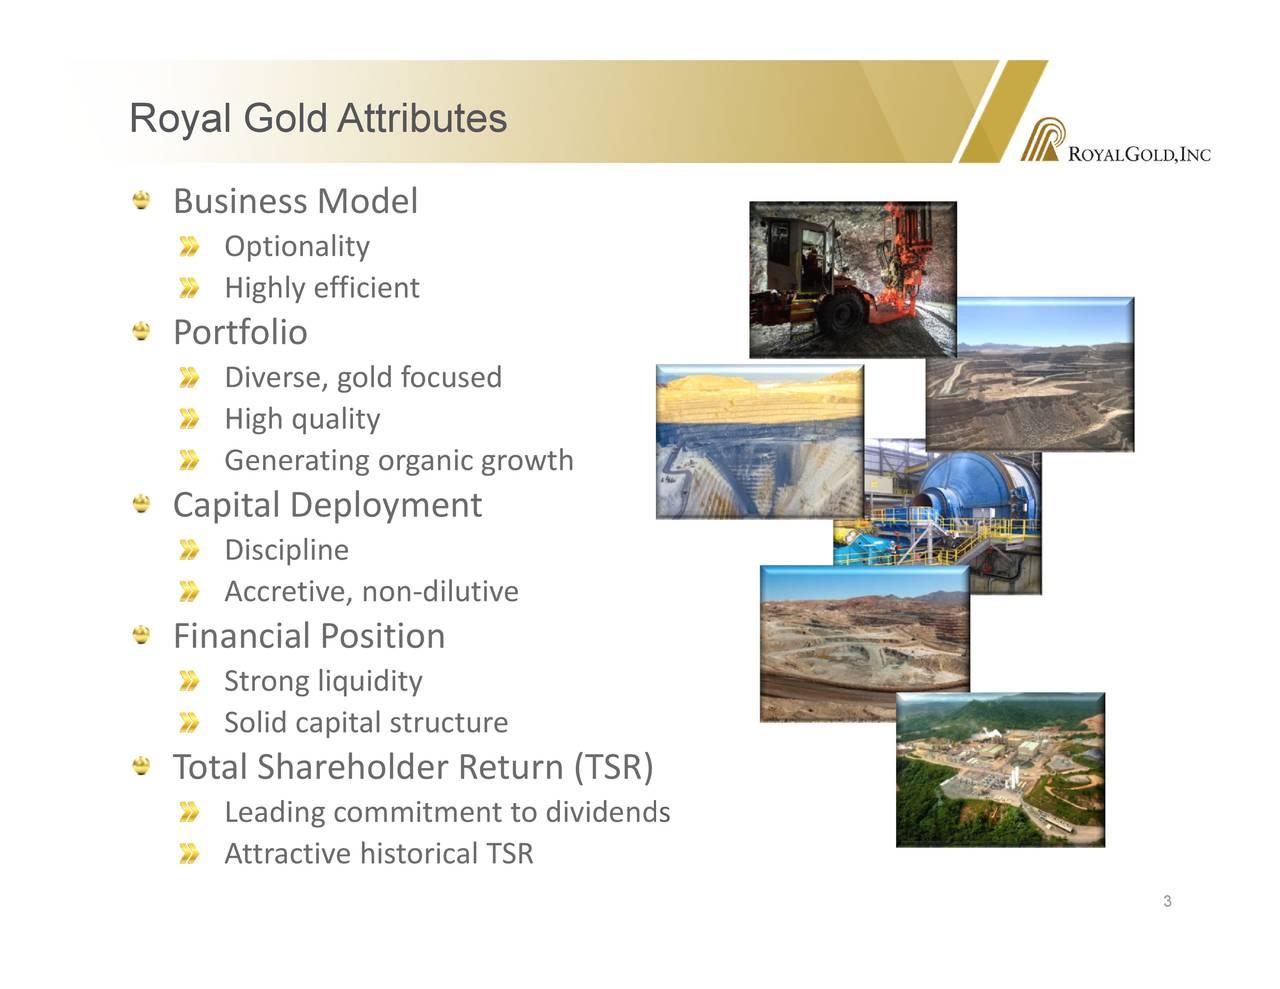 NASDAQ: RGD OptHinhli yiicigh,goediticuscretiie noldthaididitt uctereistorn BusinessP orotoelio Capital D FeiplnyciaT Ptaslihnareholder Return (TSR) Royal Gold Attributes